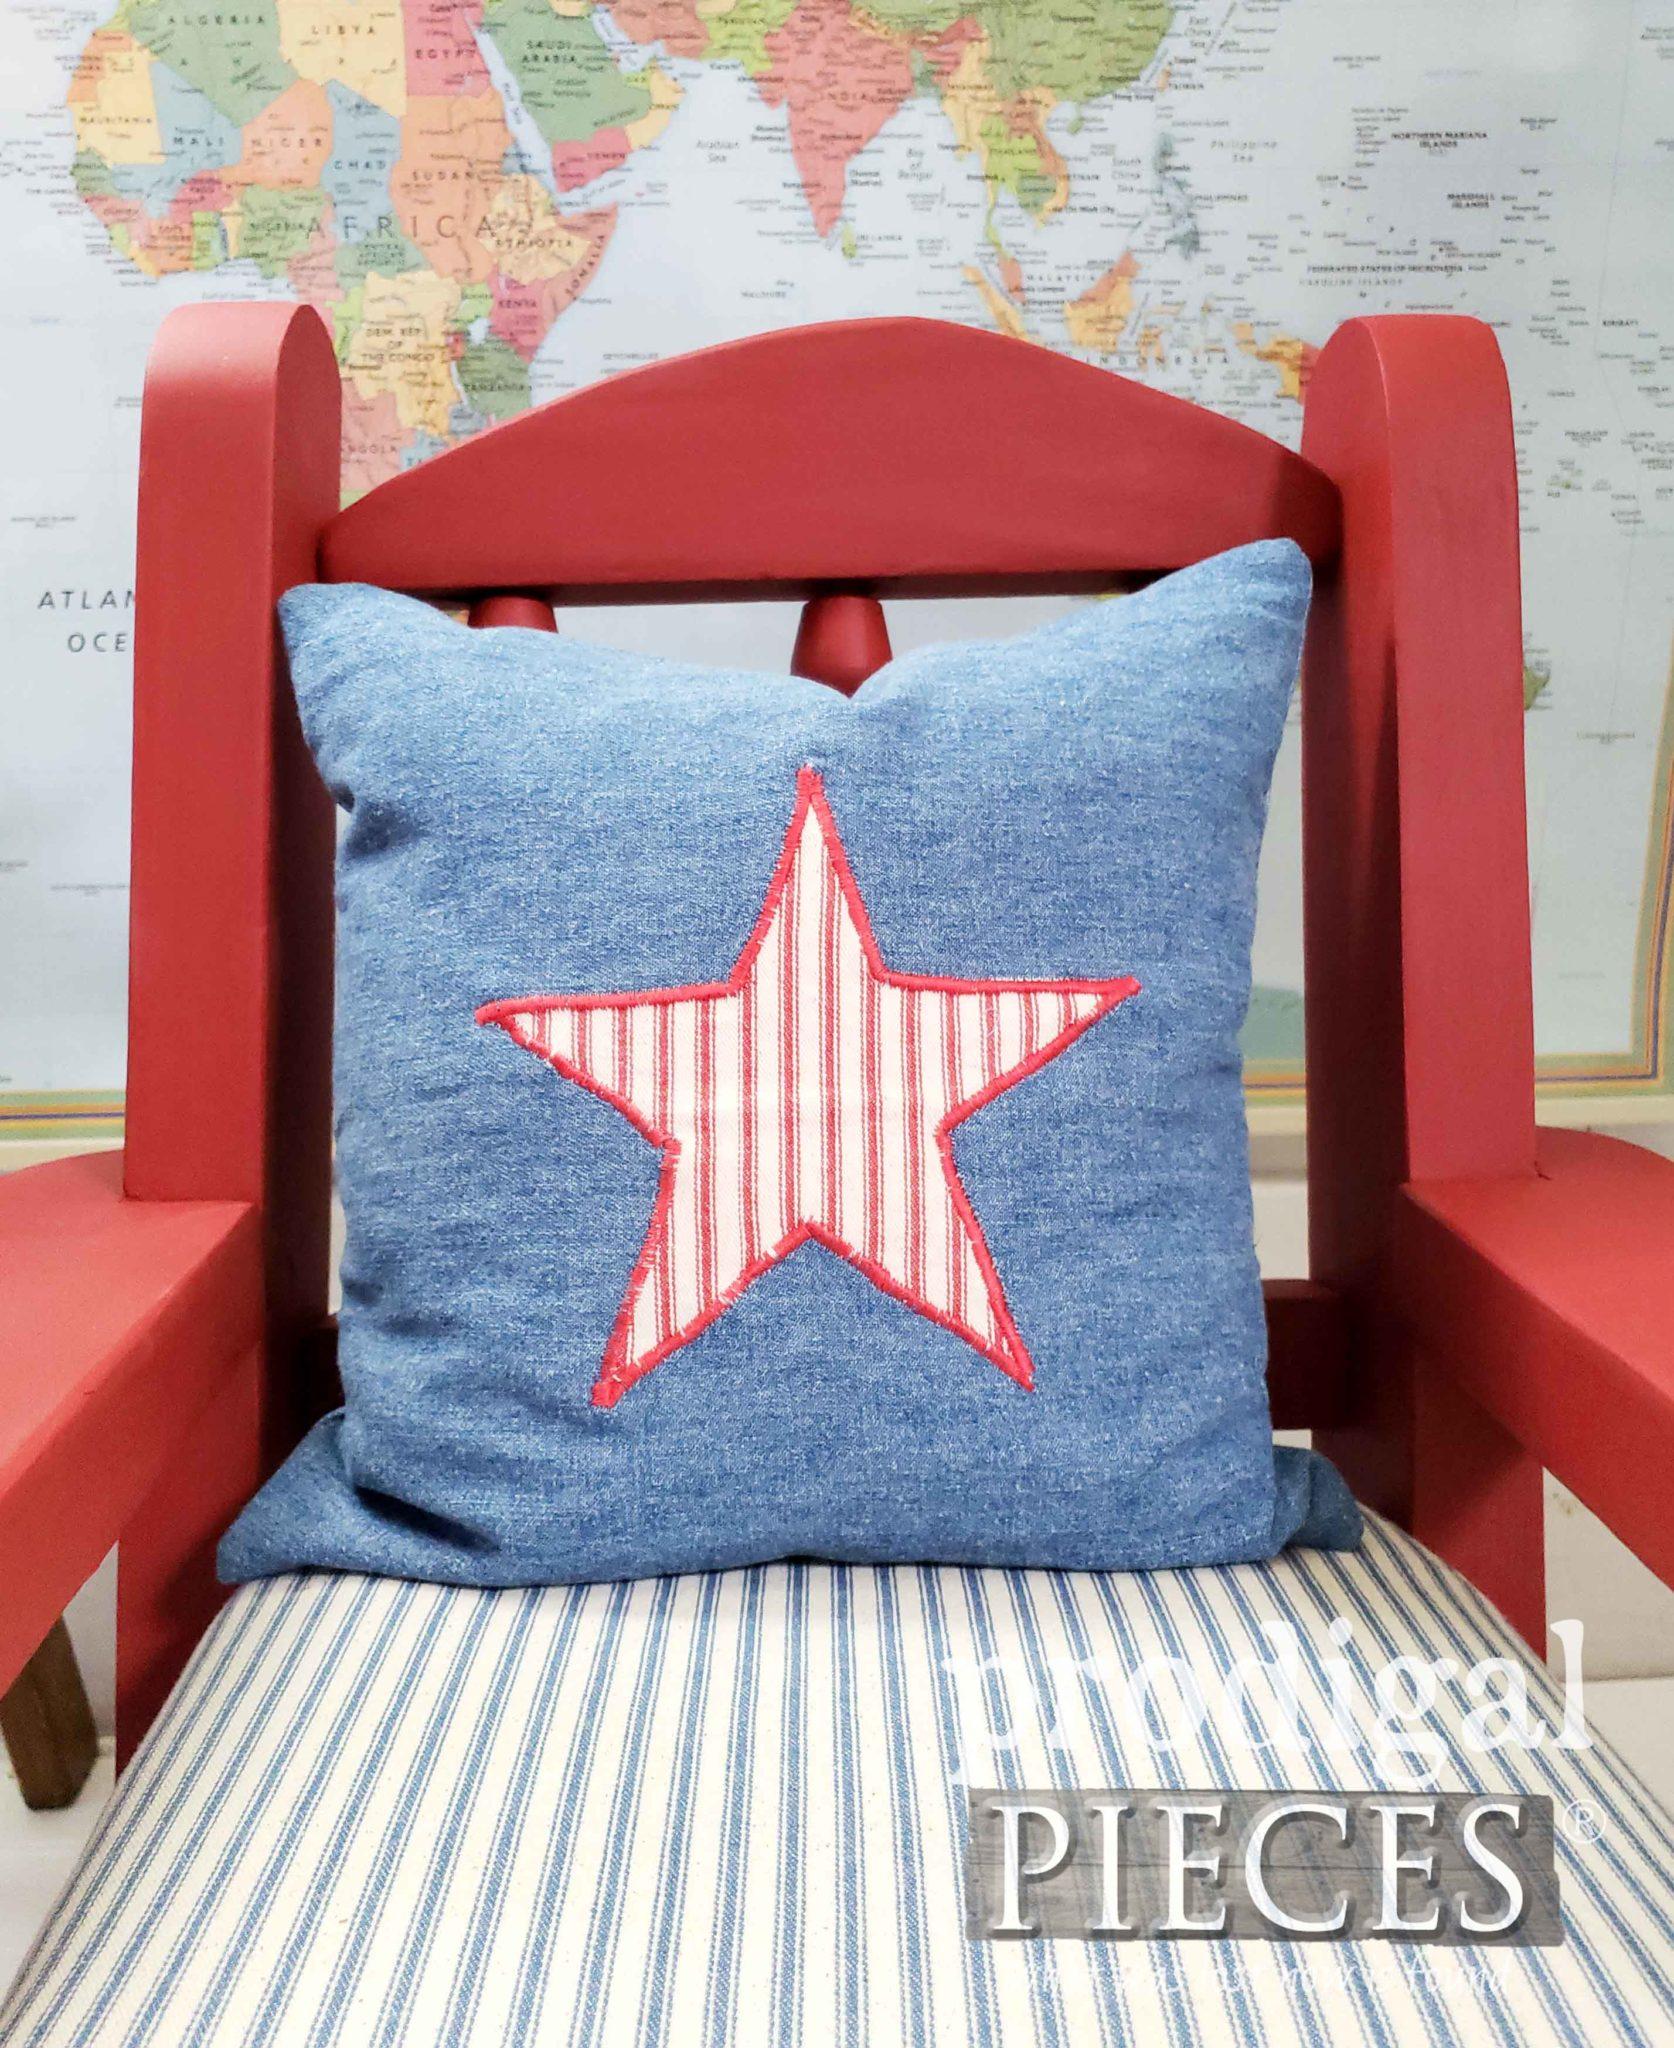 Handmade Denim Pillow with Ticking Stripe Star by Larissa of Prodigal Pieces | prodigalpieces.com